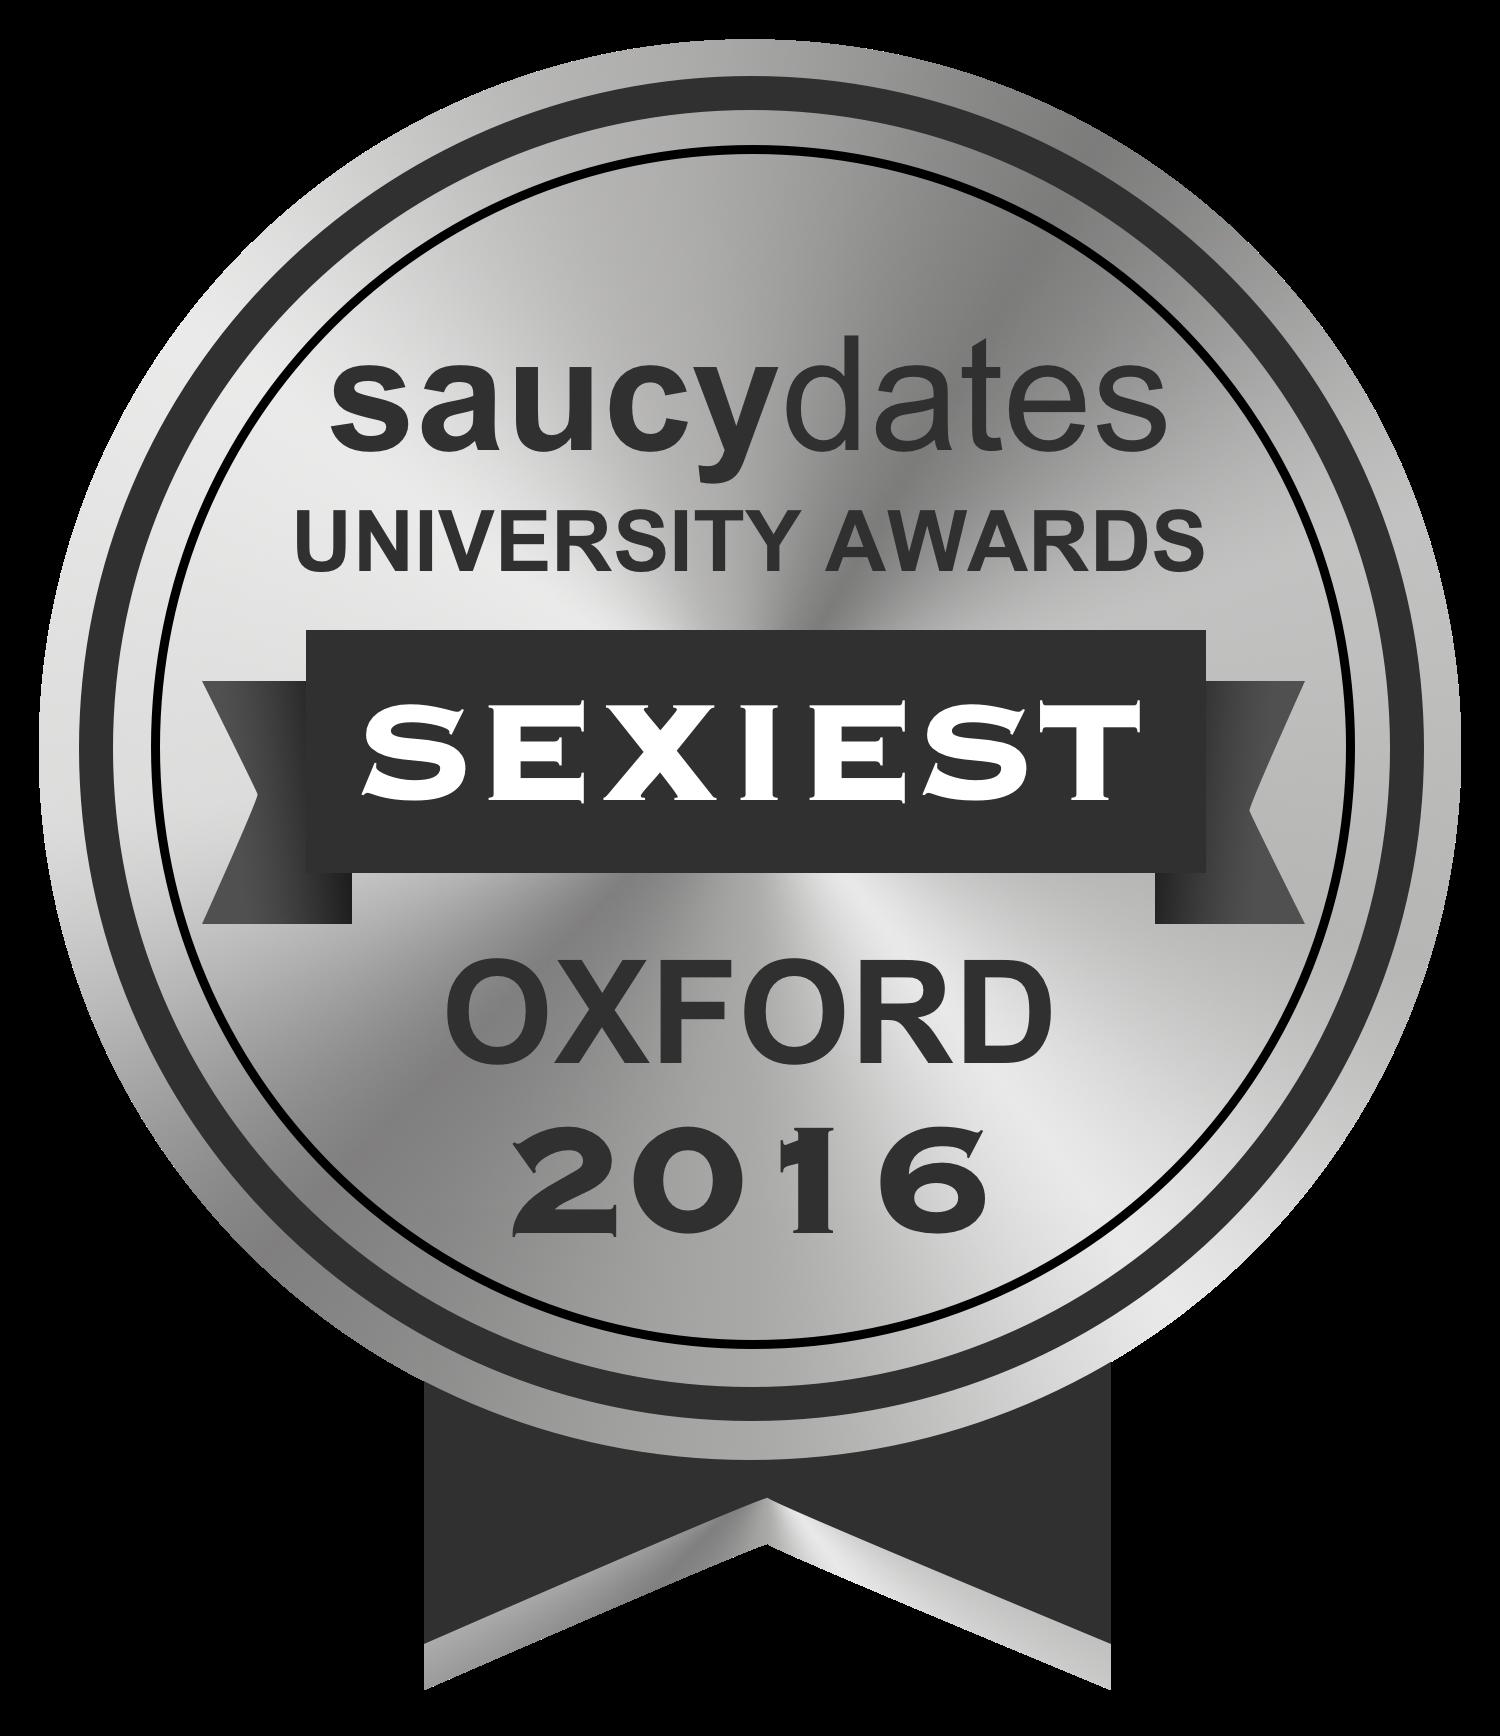 saucydates uk